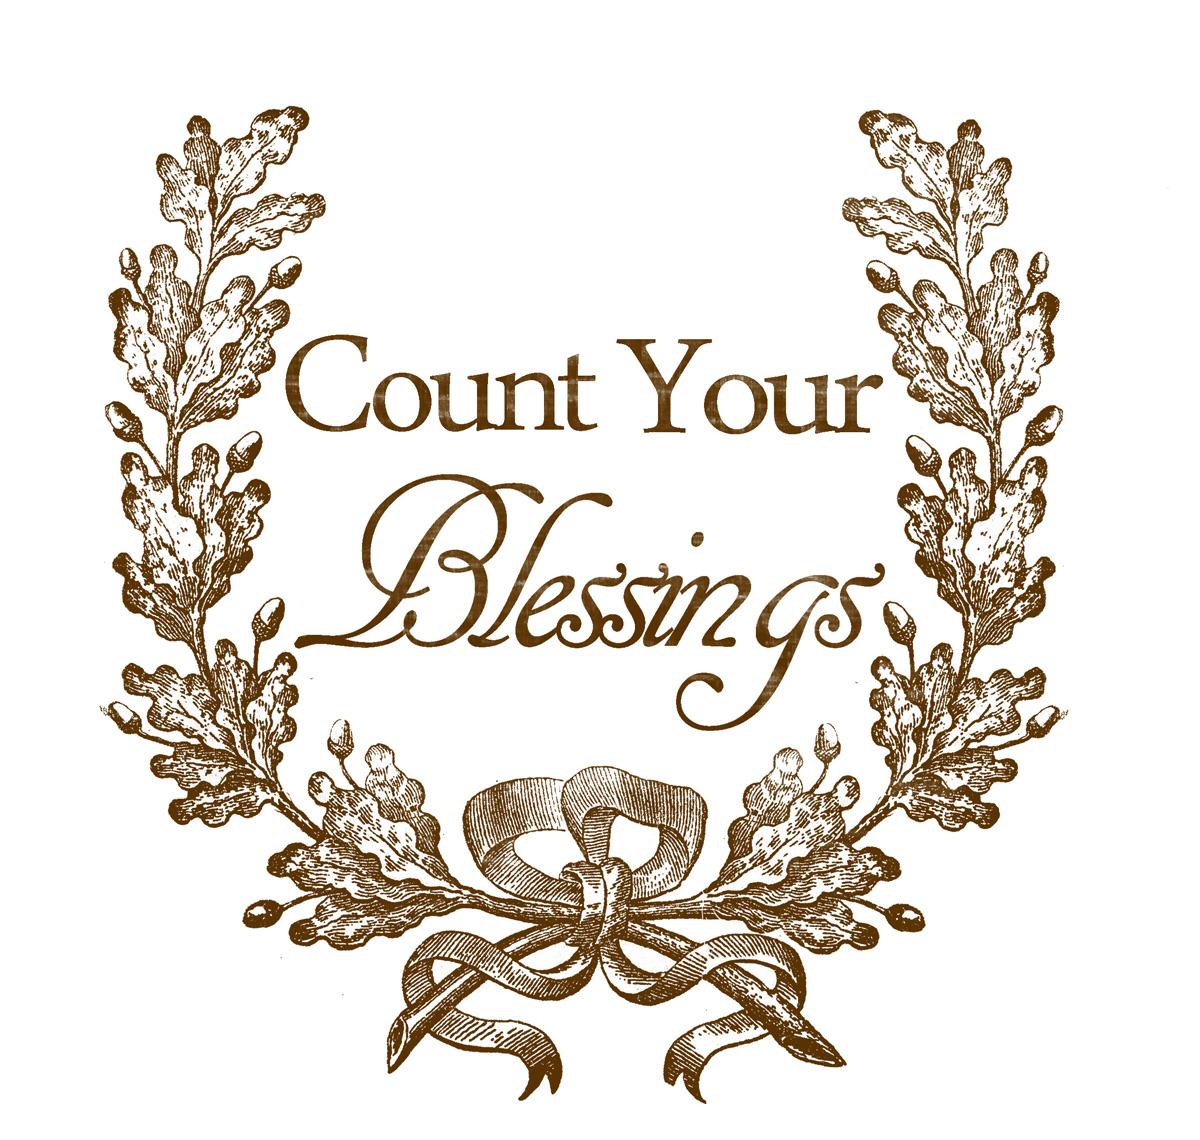 Fall Transfer Printable - Acorn Wreath - Thanksgiving! - The ...